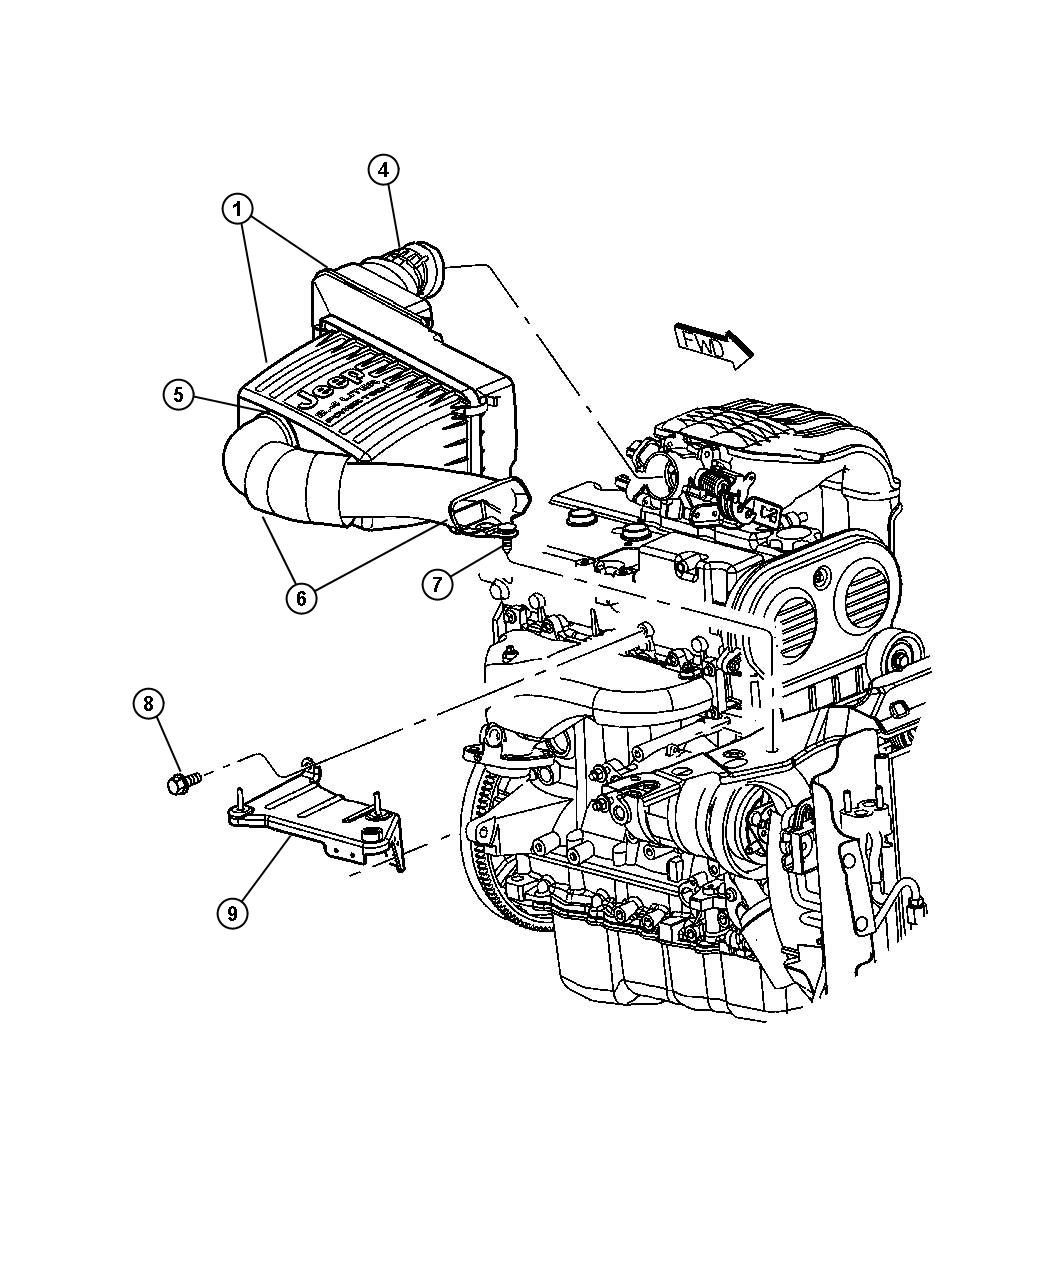 2011 Dodge Nitro HEAT 3.7L V6 4X4 Rivet. Mounting